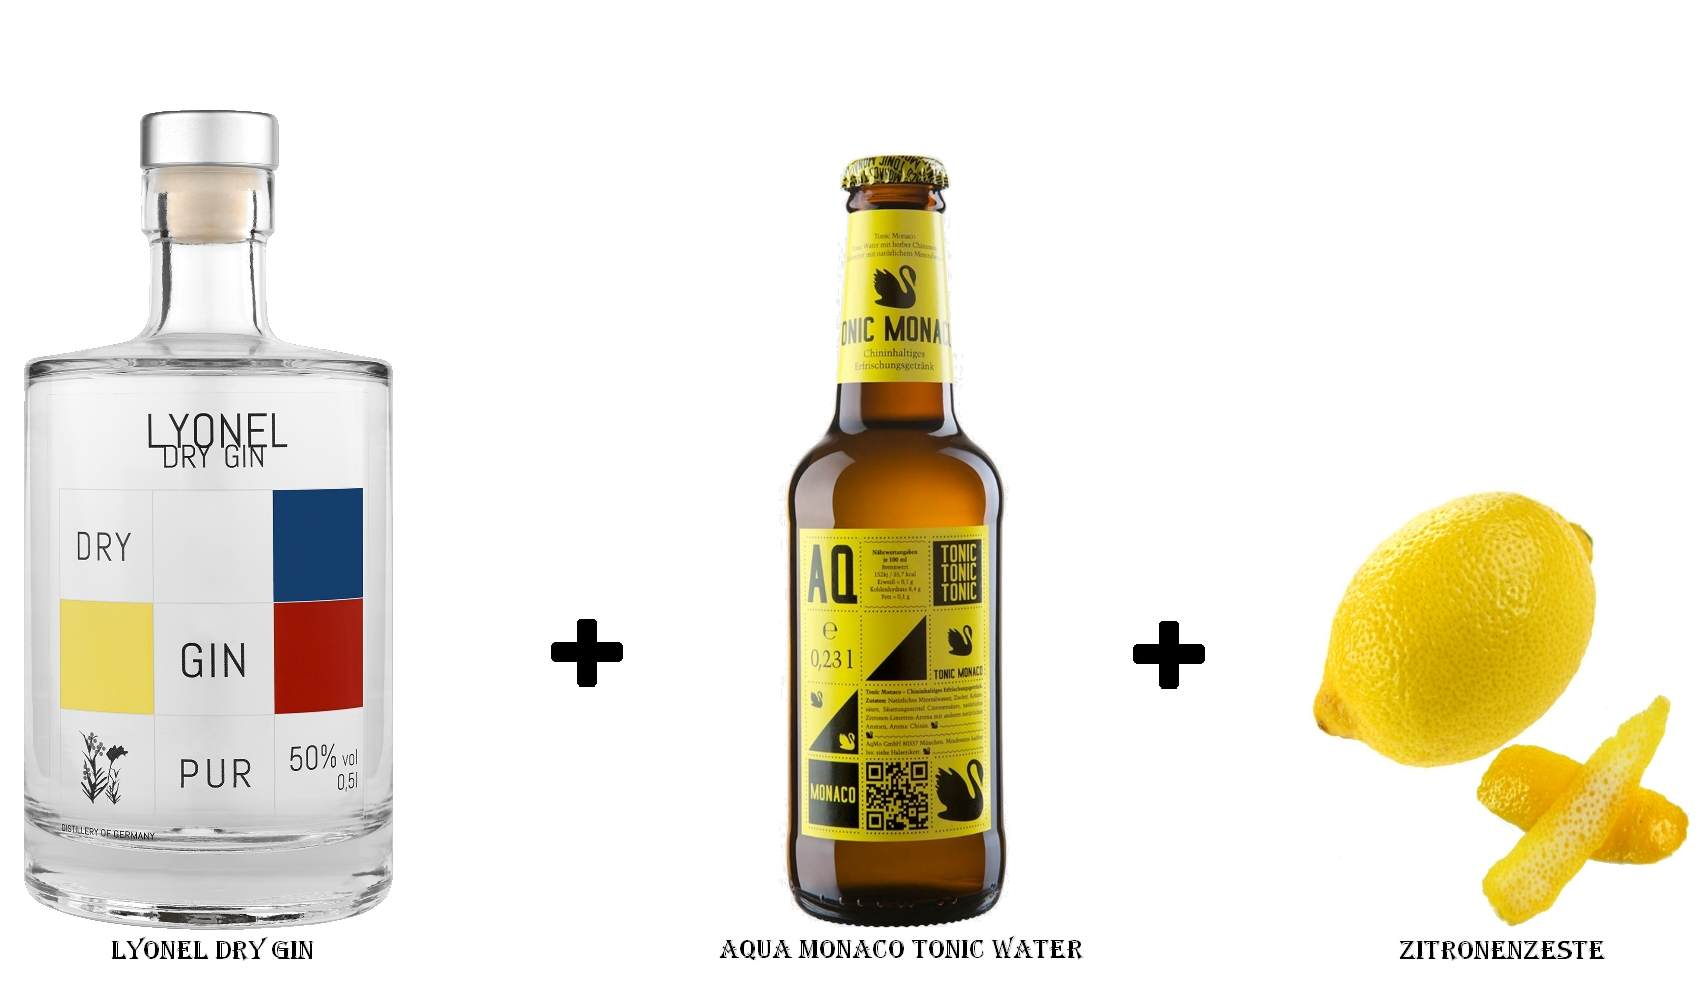 Lyonel Dry Gin + Aqua Monaco Tonic Water + Zitronenzeste